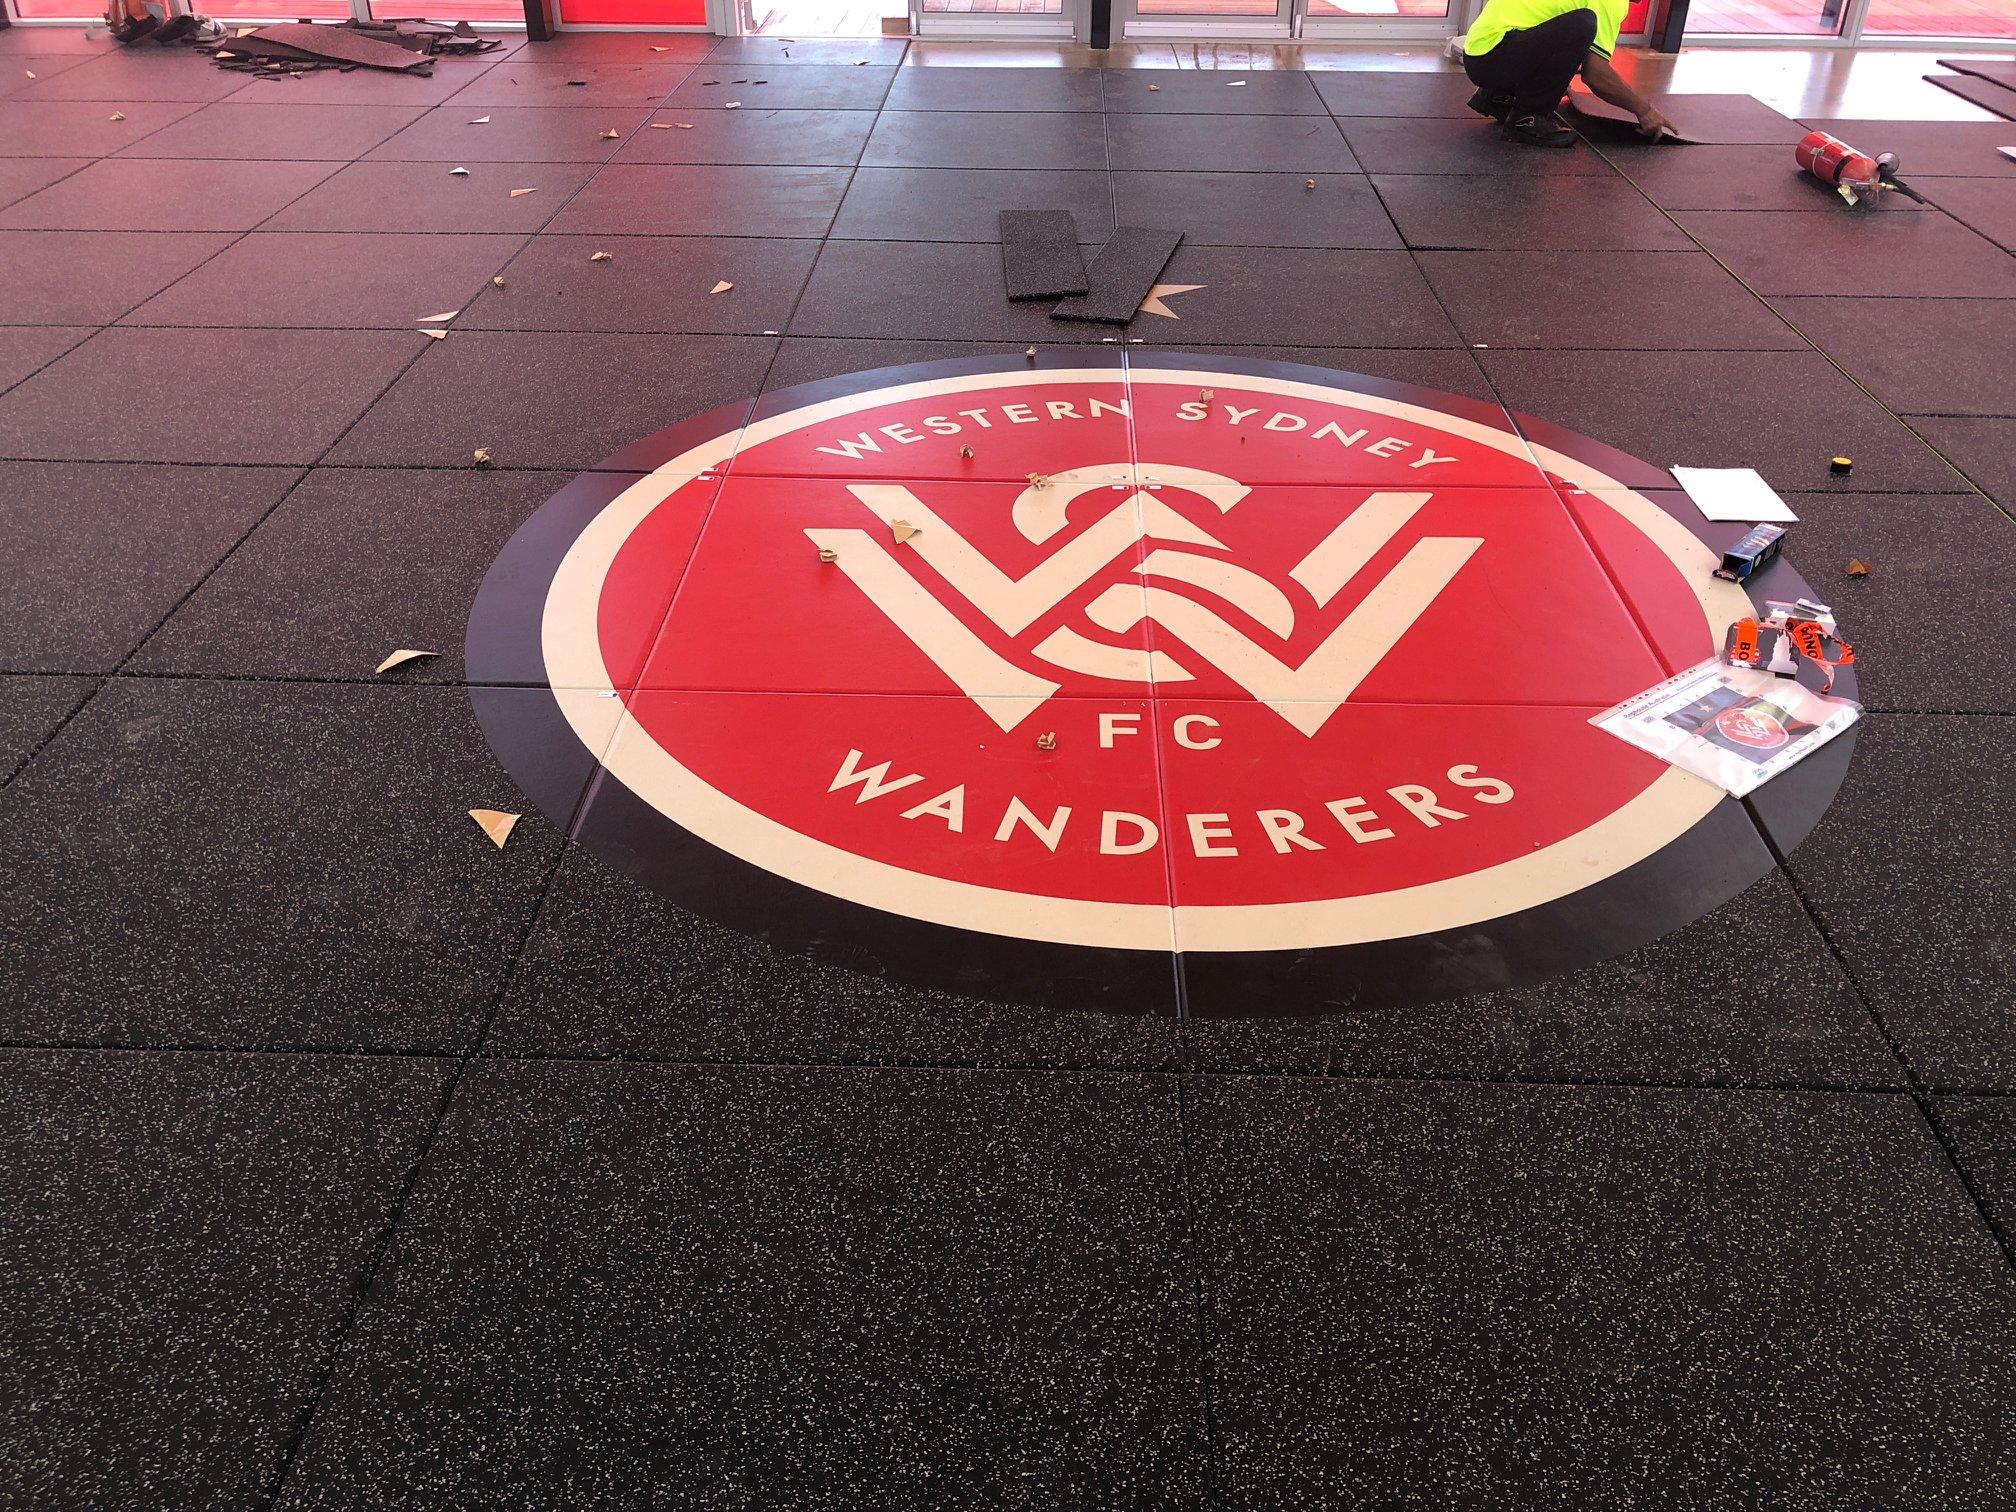 Wanderers Gym